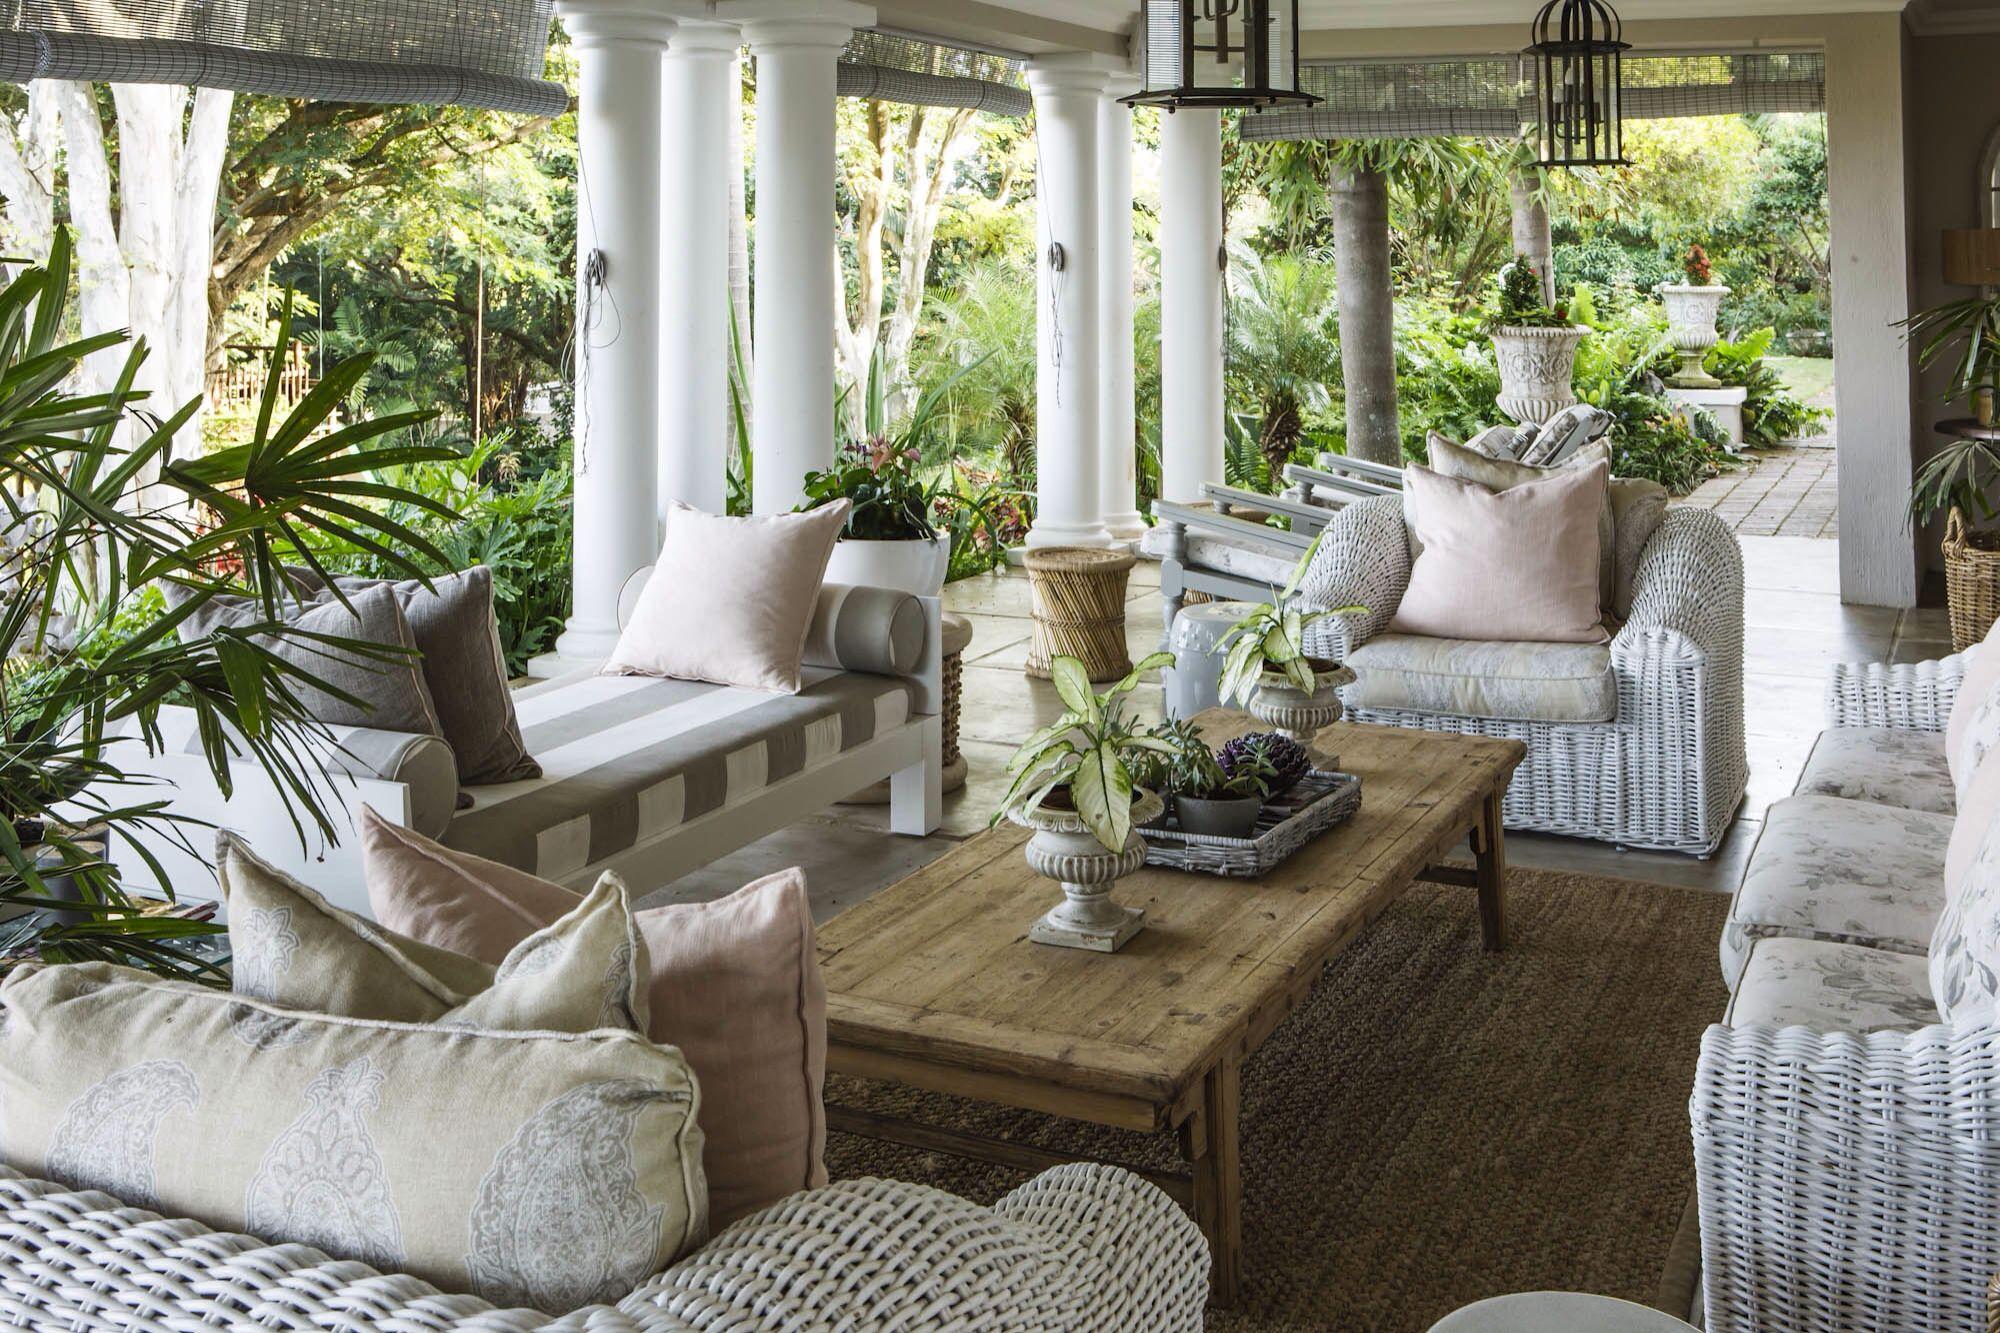 Ruth Duke Umhlanga South Africa With Images Home Deco